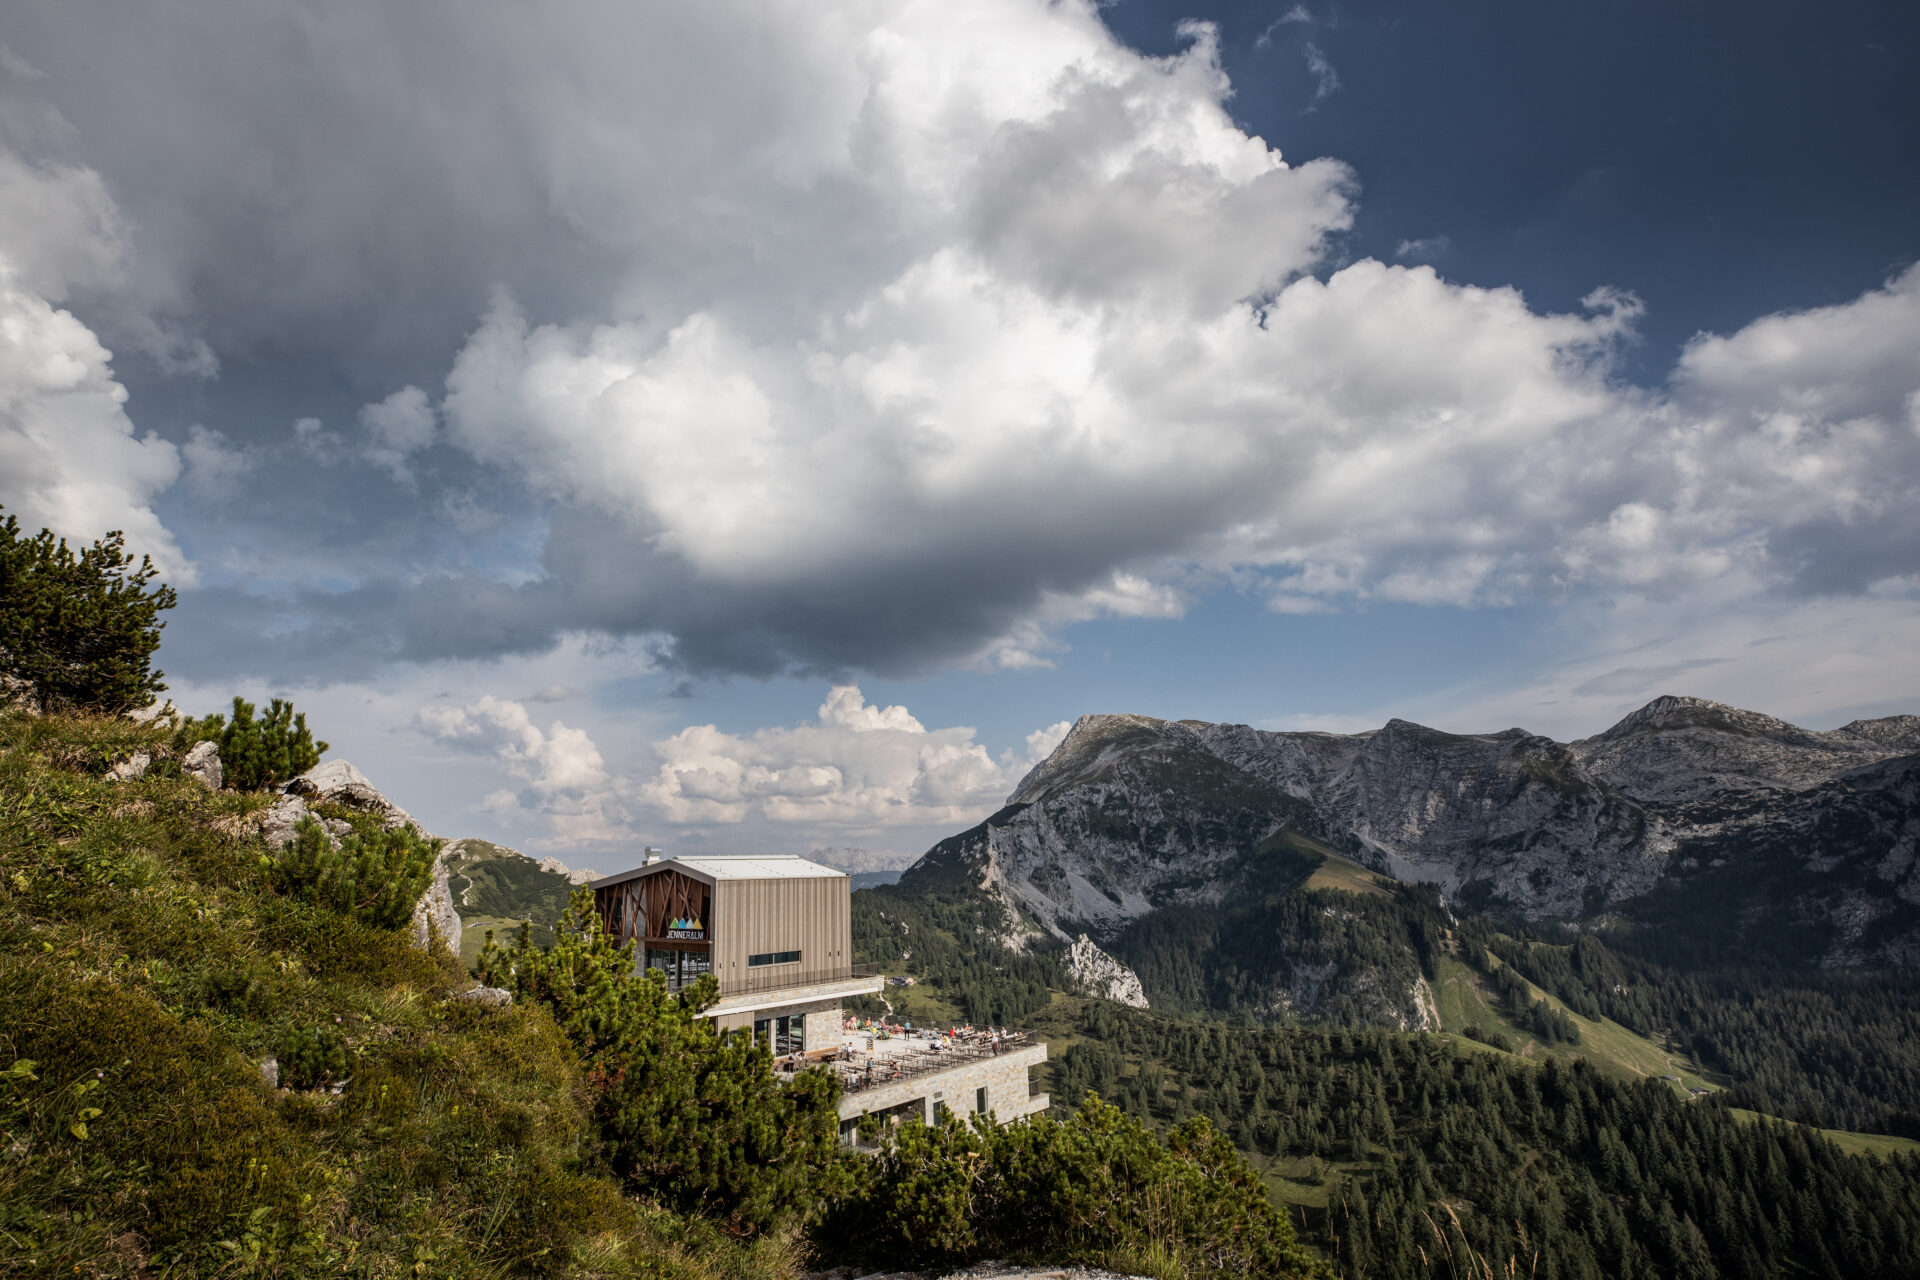 Jennerbahn Panorama mit Bergstation